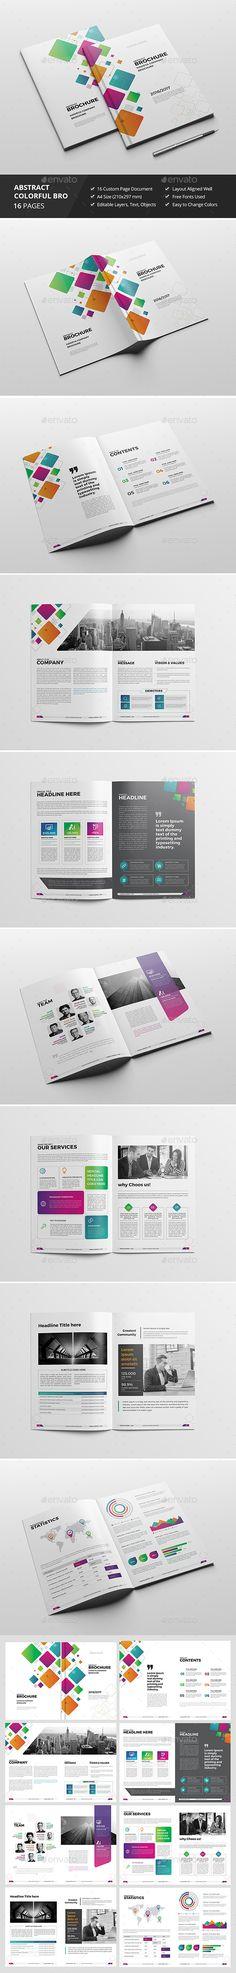 Haweya Colorful Brochure 02 - Corporate #Brochures Download here: https://graphicriver.net/item/haweya-colorful-brochure-02/18415659?ref=alena994